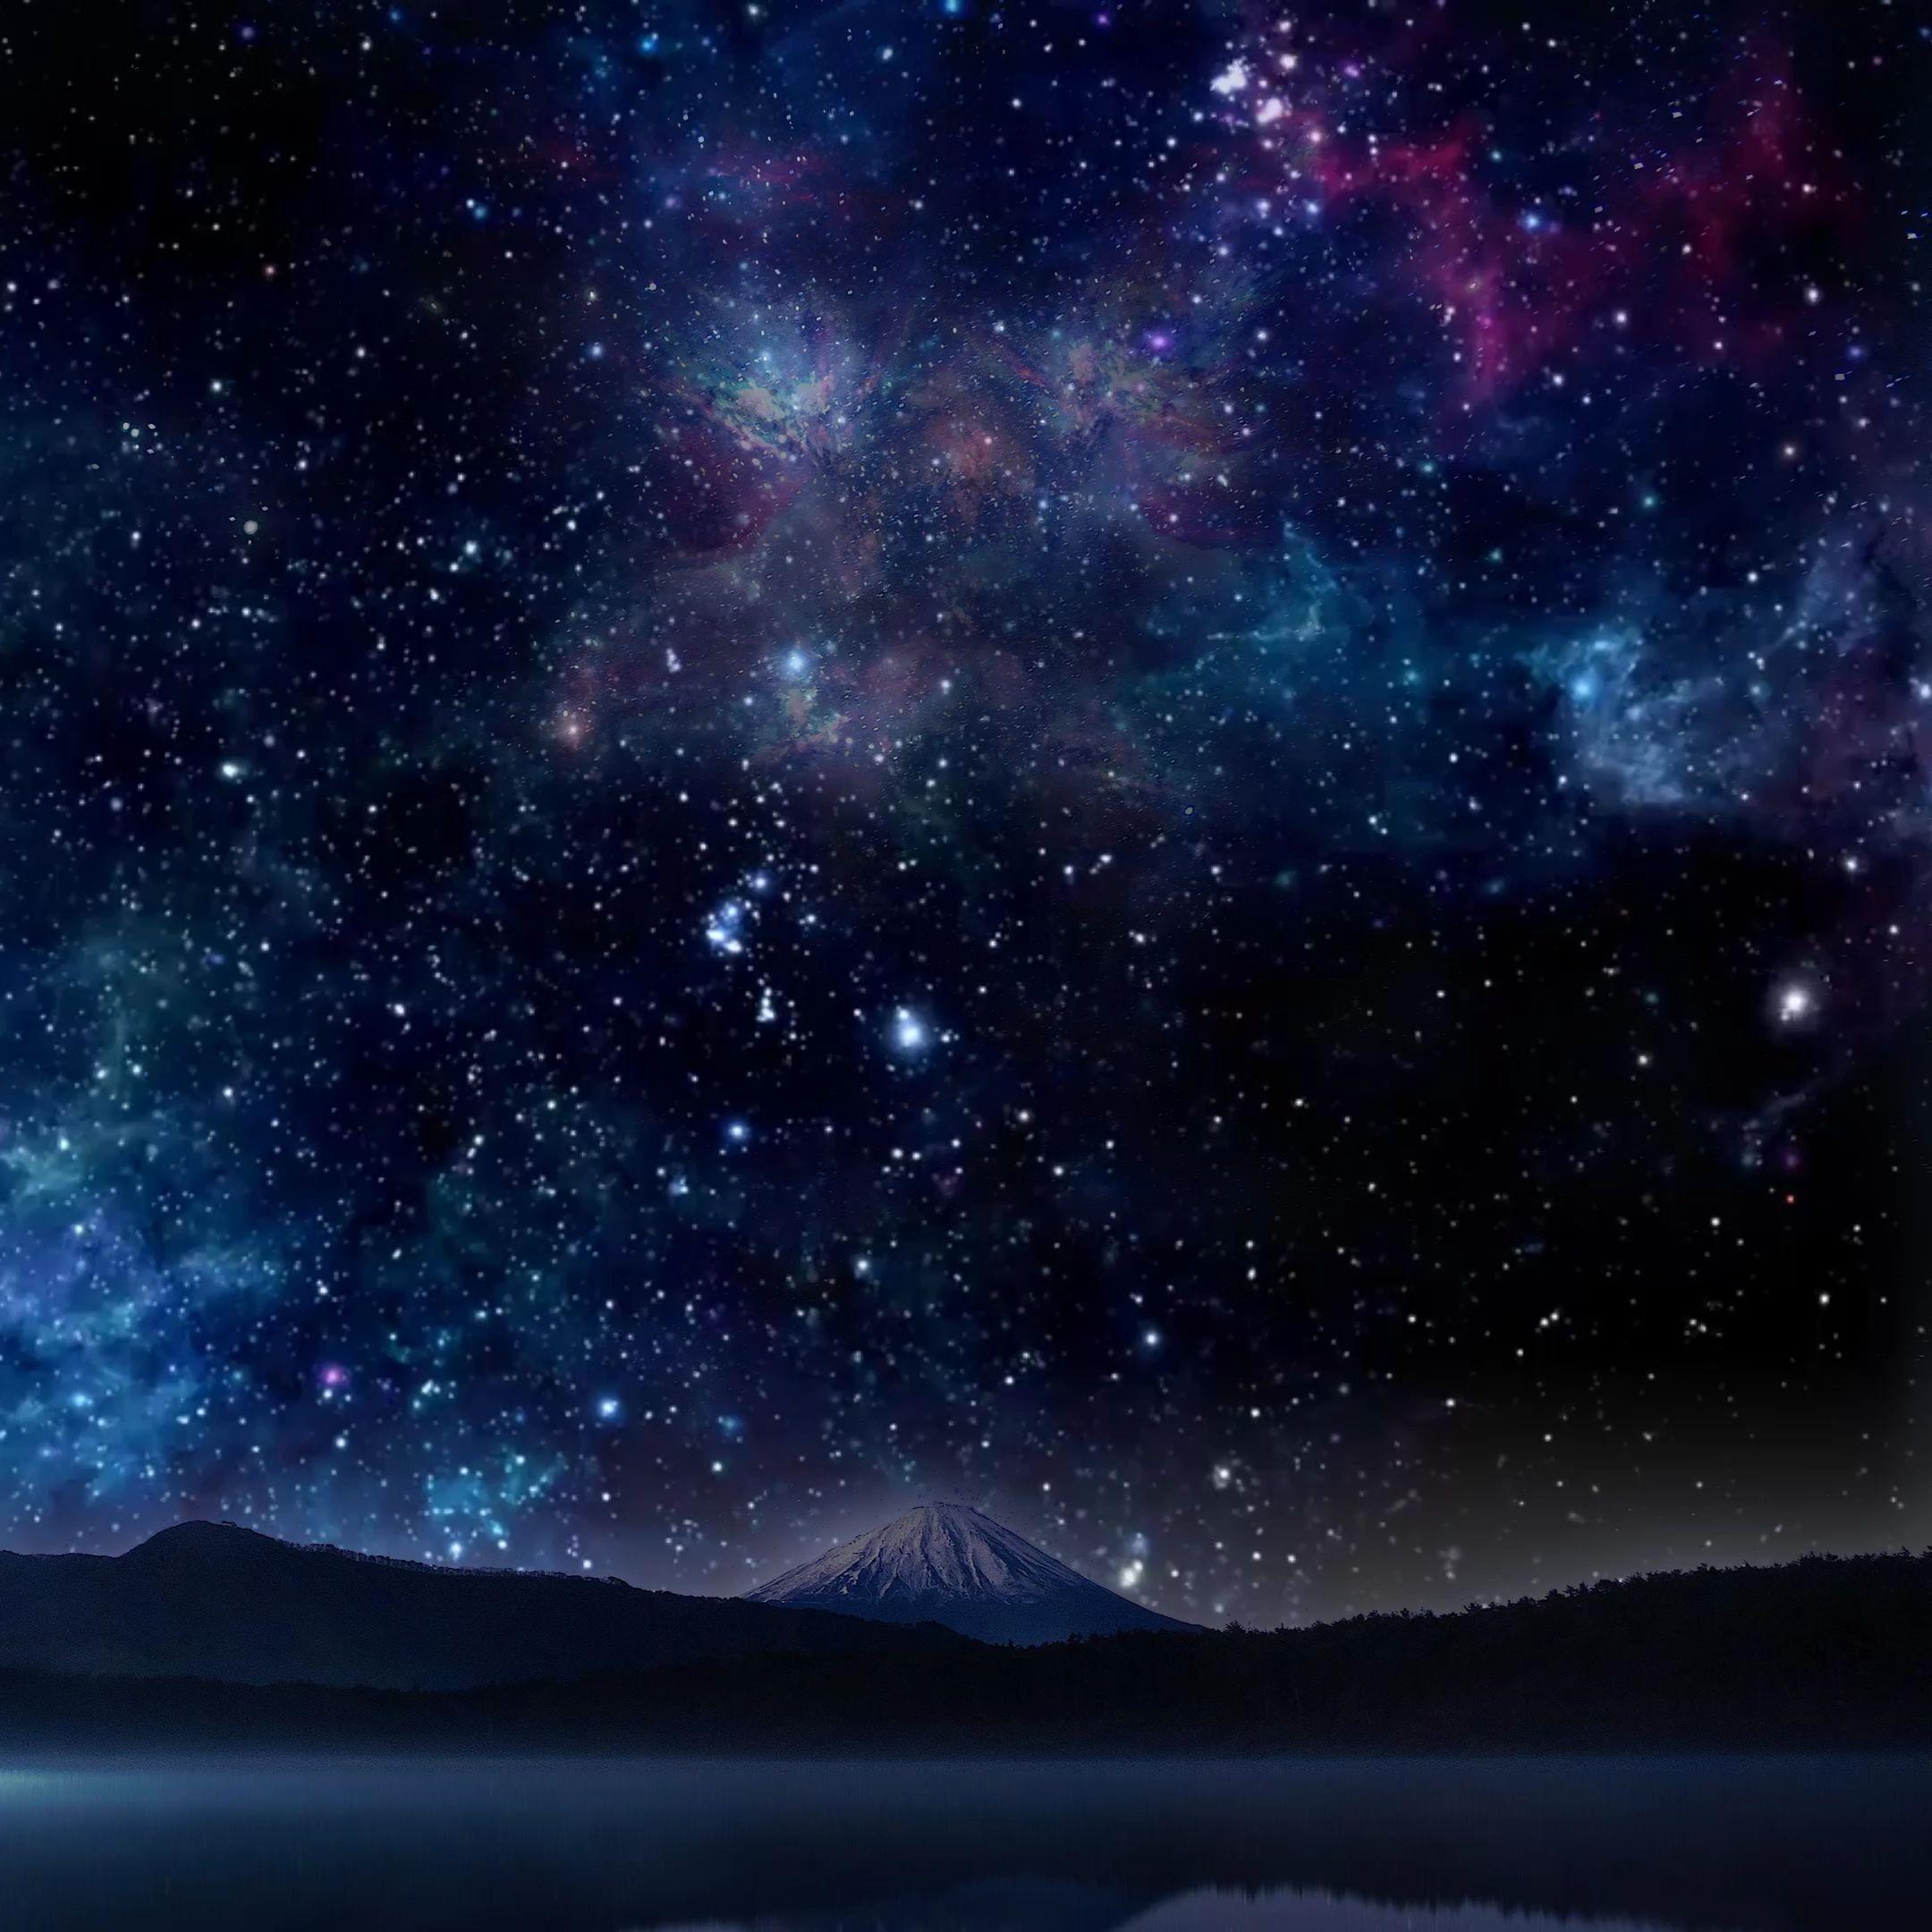 Sky Stars Clouds Sky Animation Animations Cute Galaxy Wallpaper Galaxy Wallpaper Night Sky Wallpaper